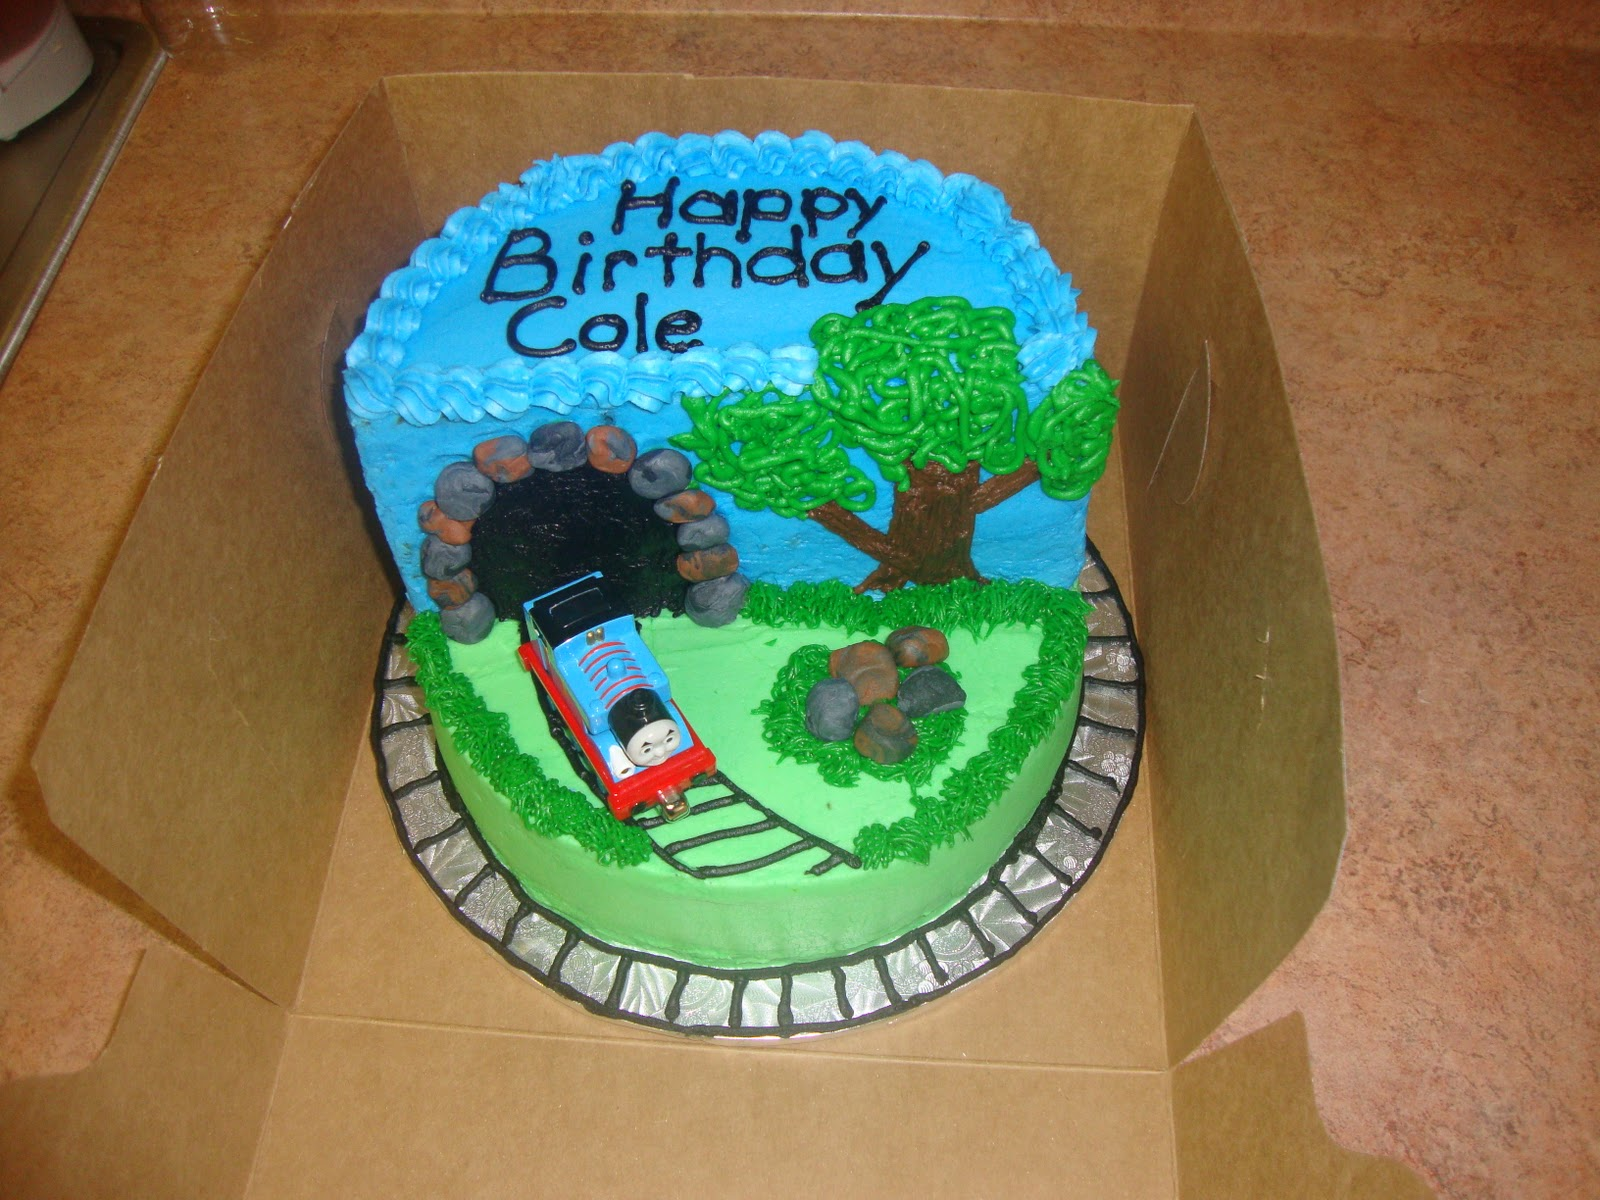 Thomas the train cakes decoration ideas little birthday cakes